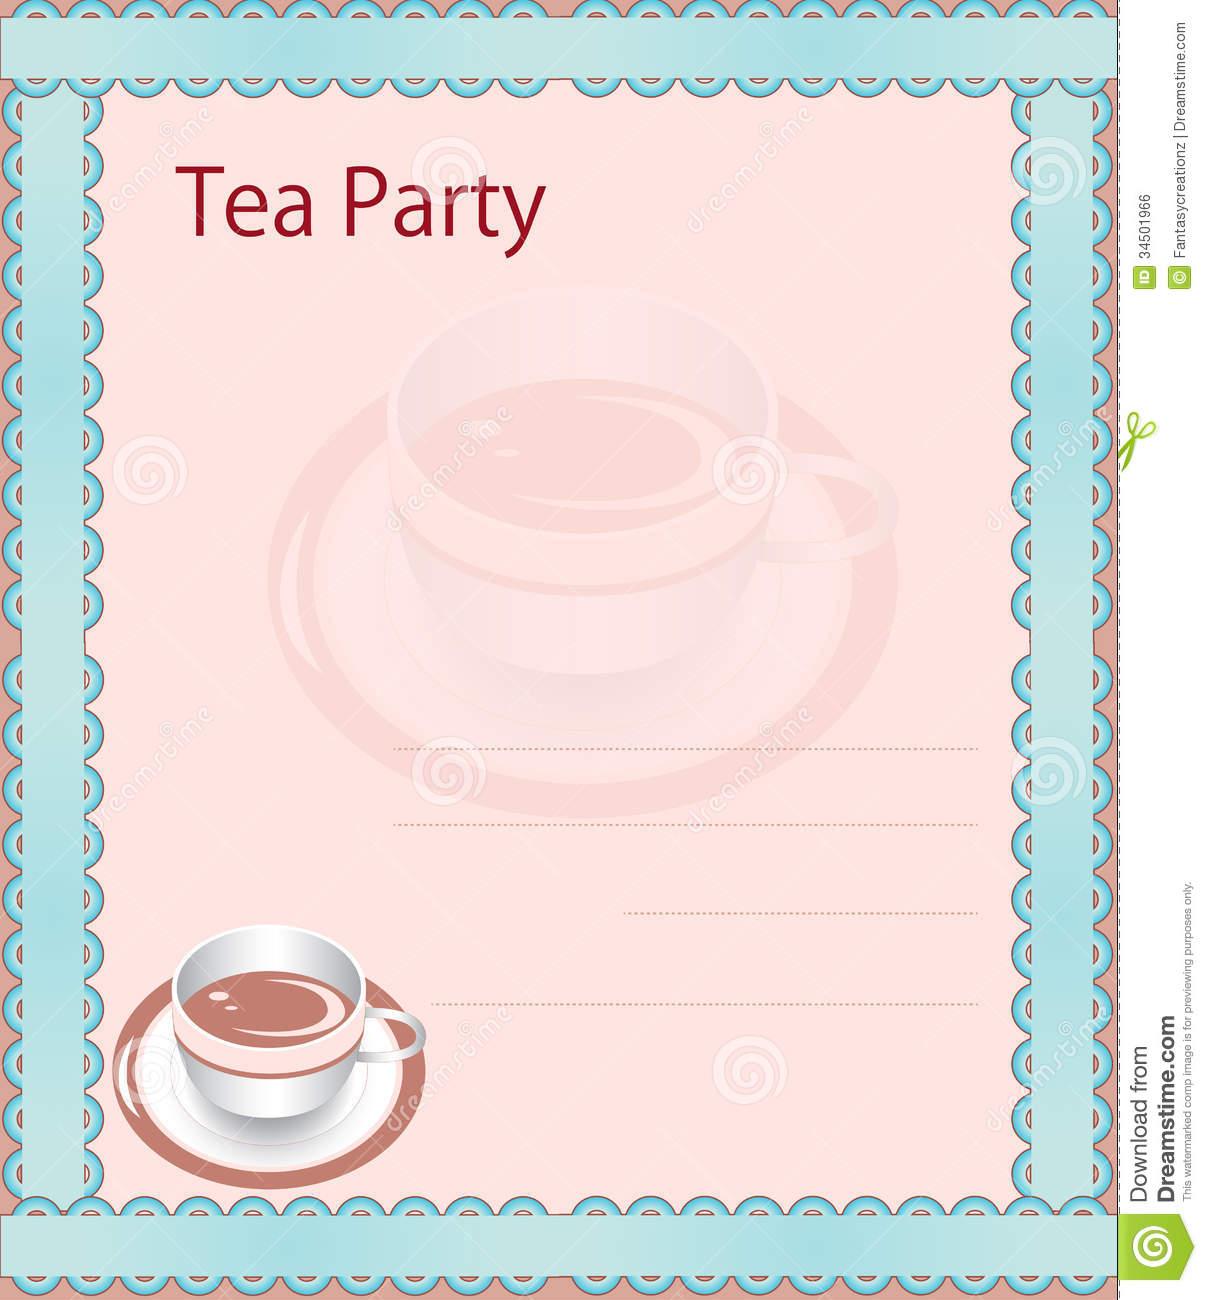 Tea Party Invitations Clip Art Otfwfs Clipart Kid